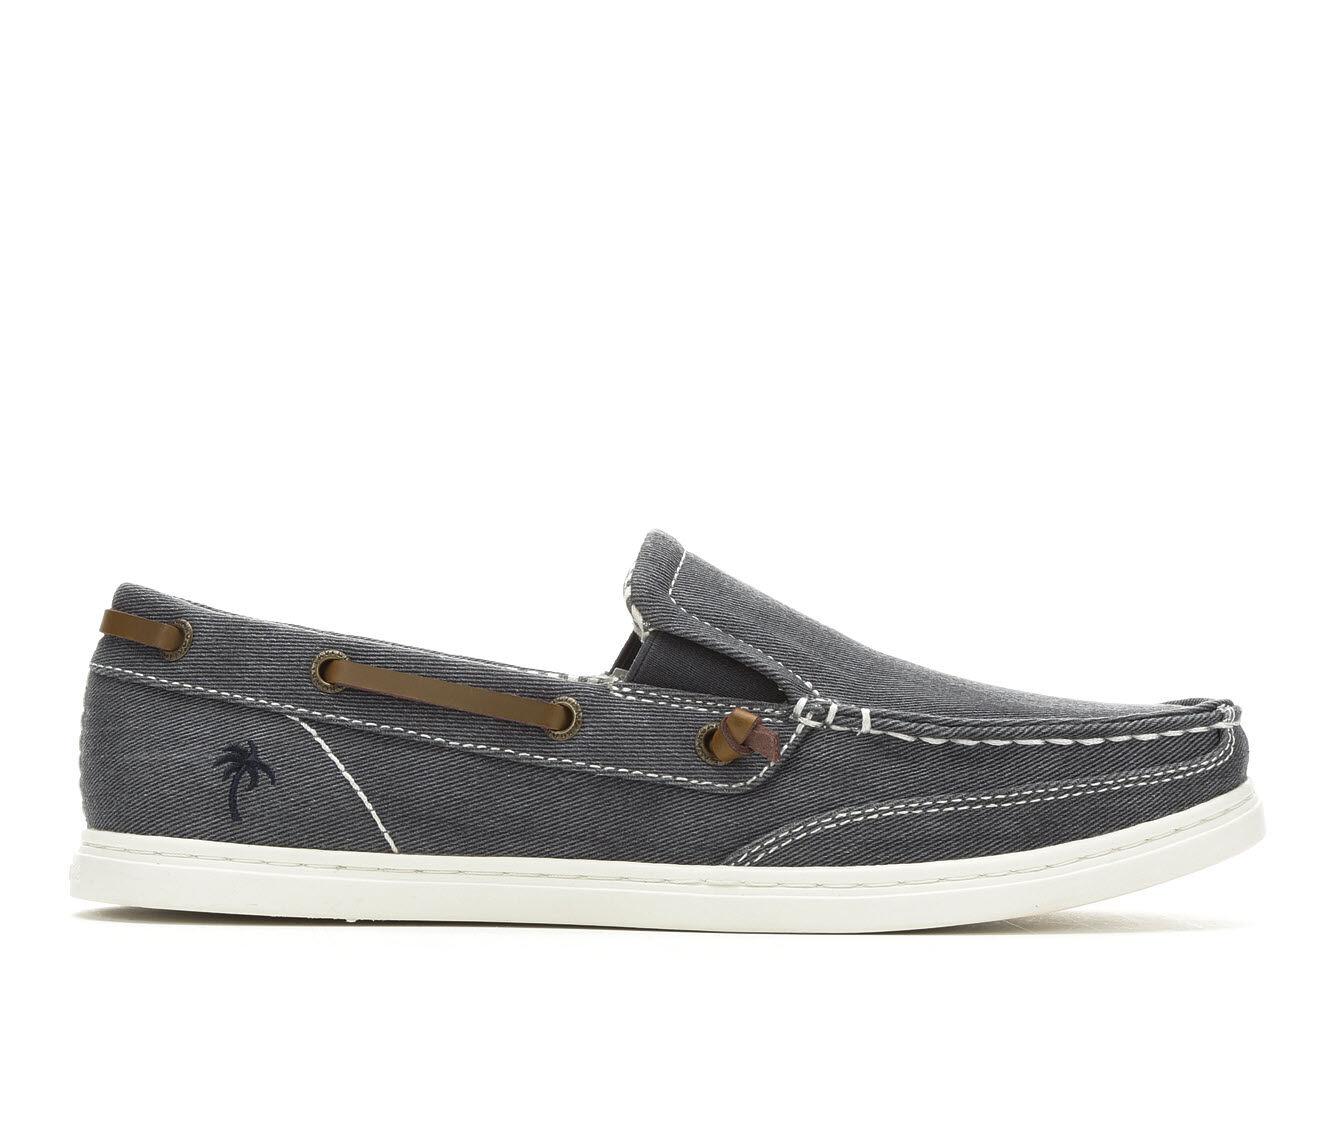 Men's Margaritaville Dock Casual Shoes Navy